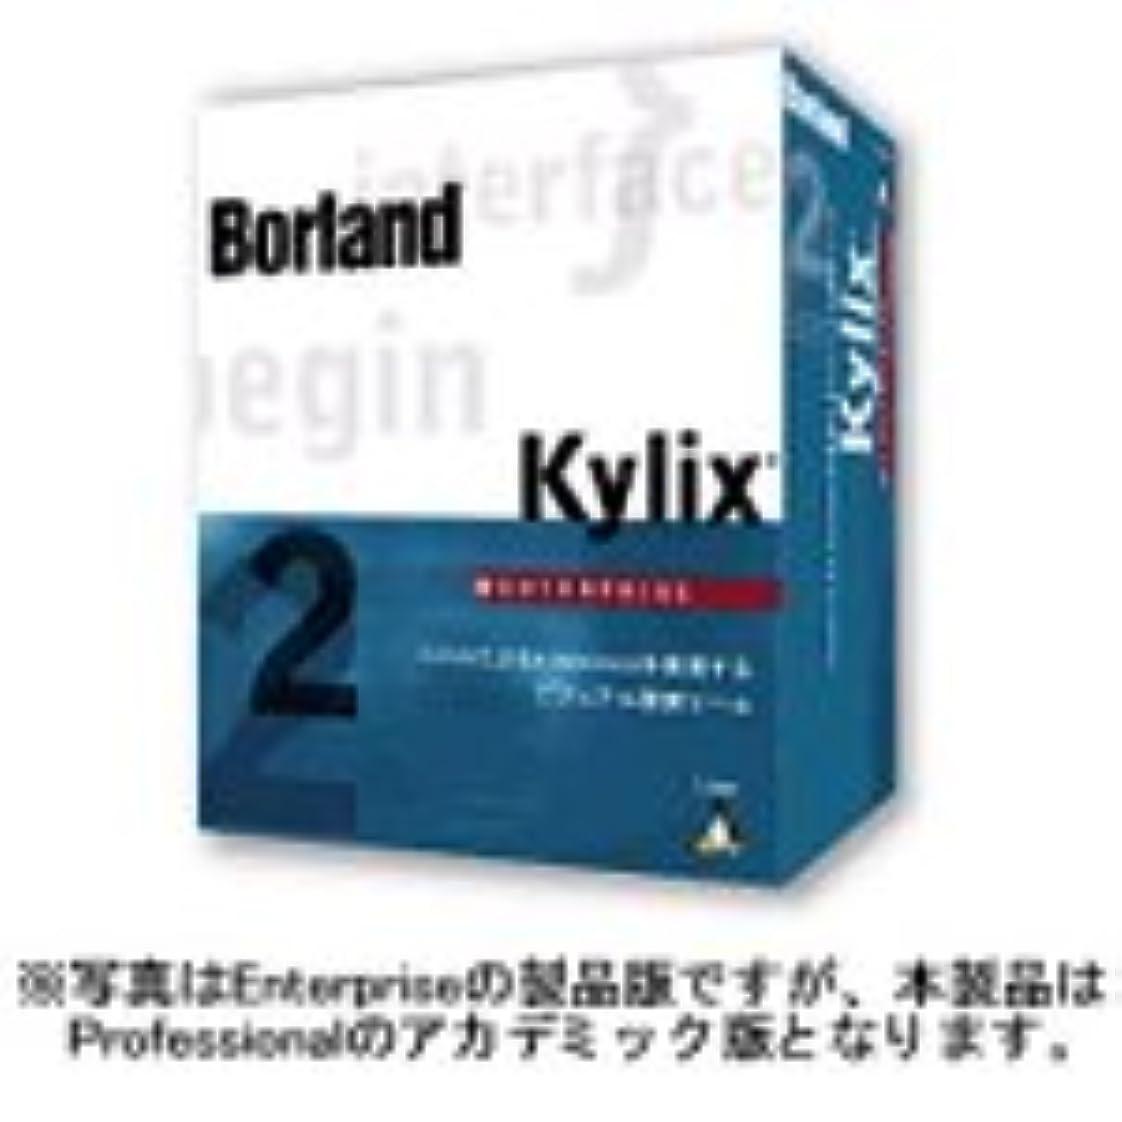 Borland Kylix 2 Professional アカデミックパック1